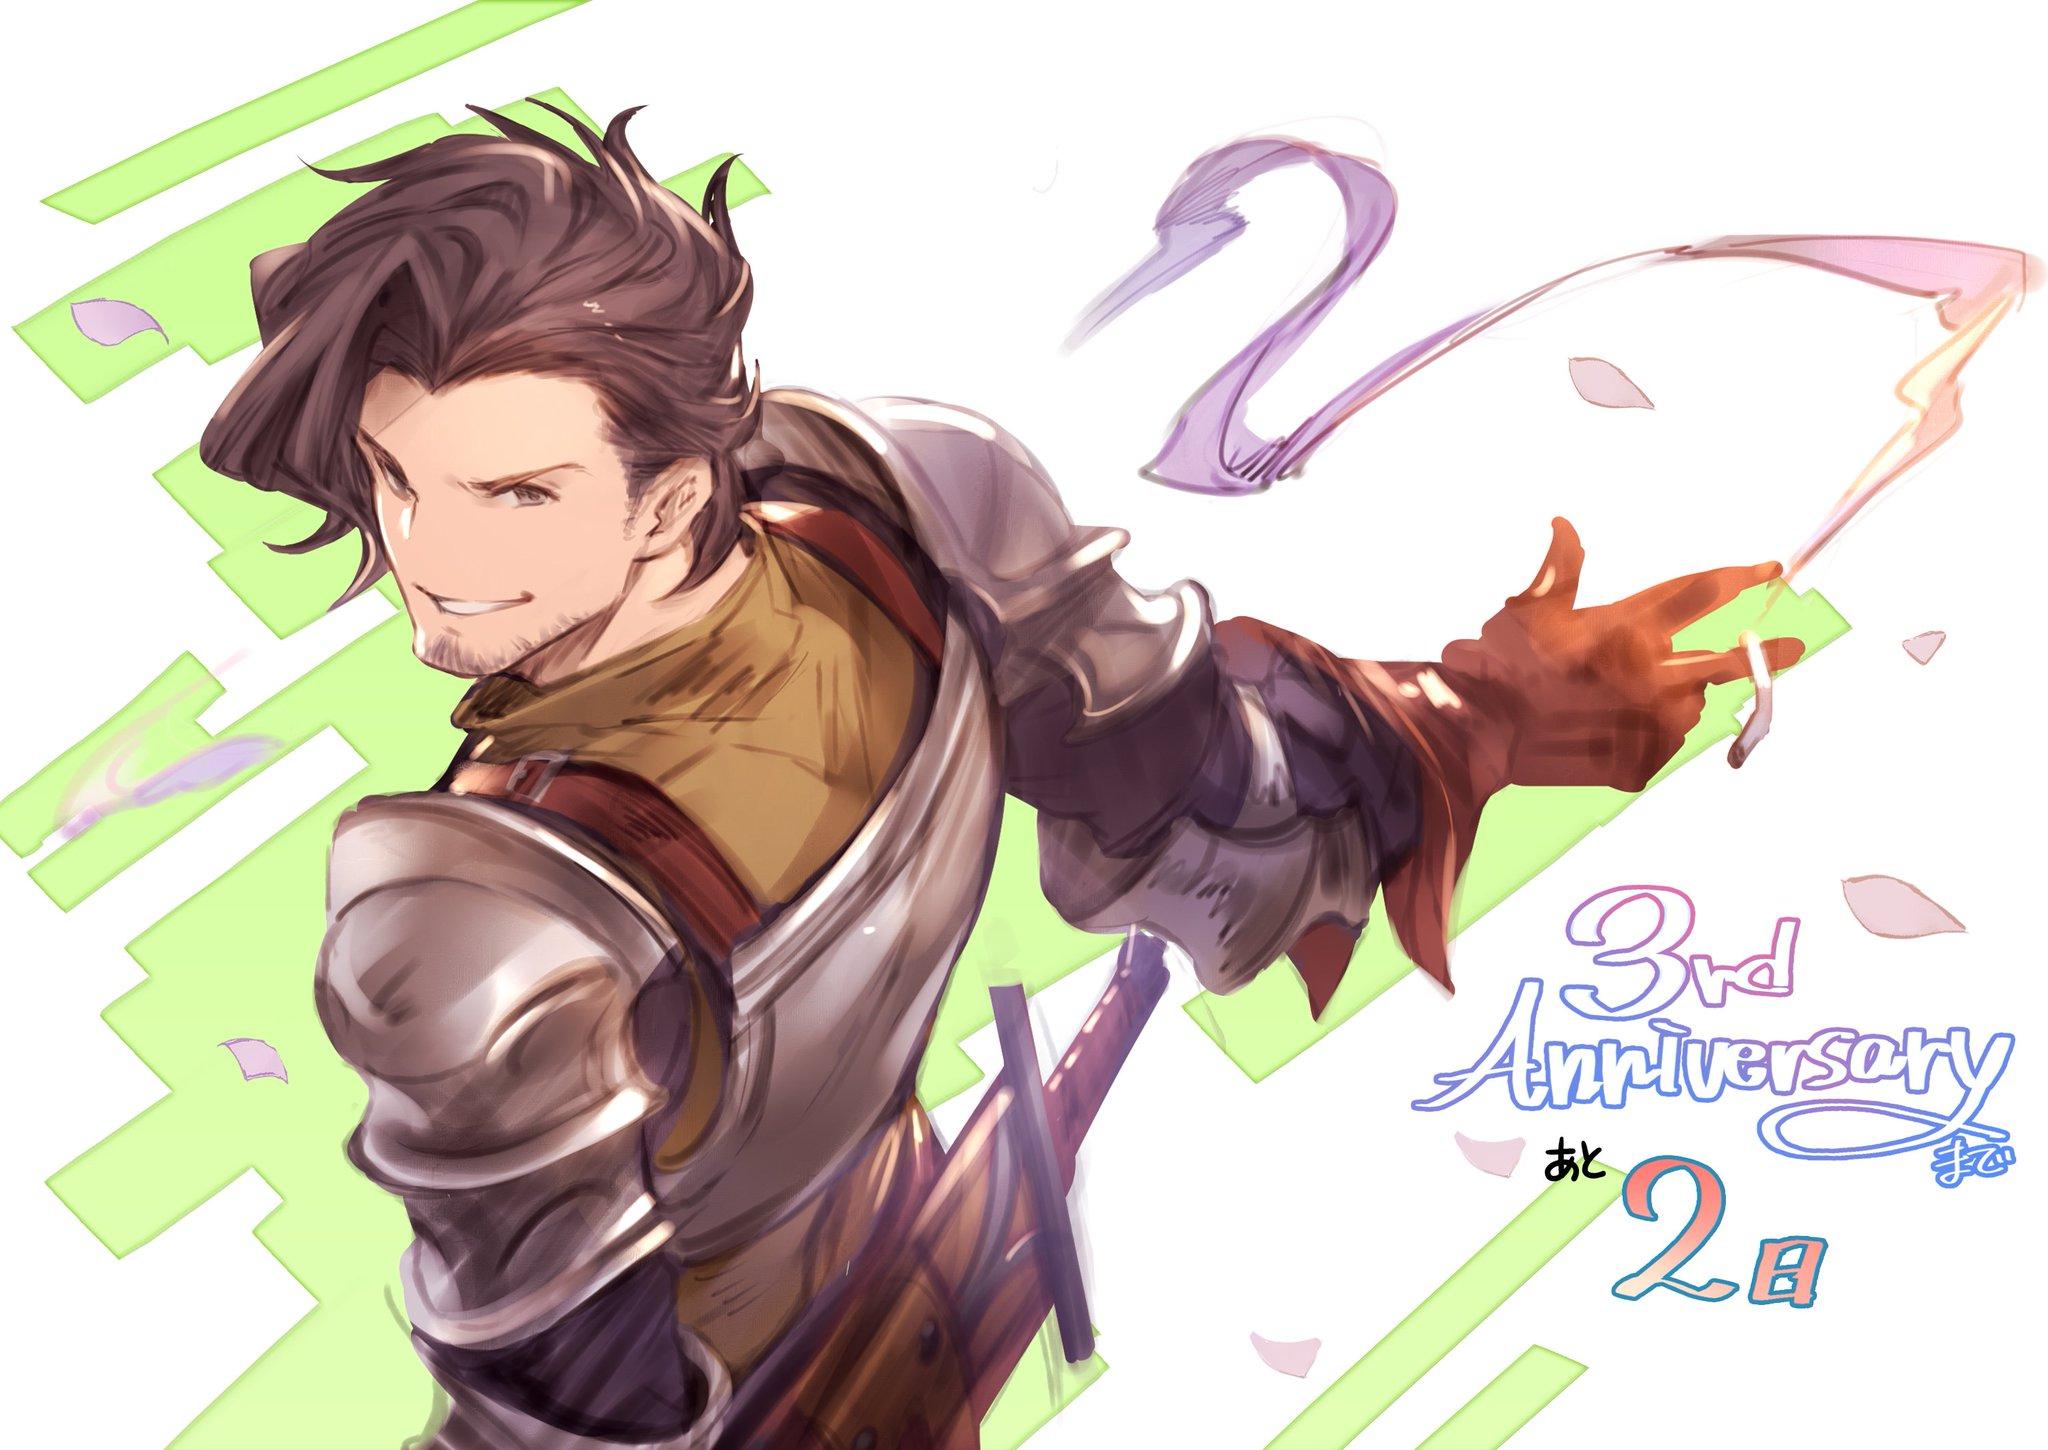 Hideo Minaba Twitter Hideo minaba is a games artist. hideo minaba twitter